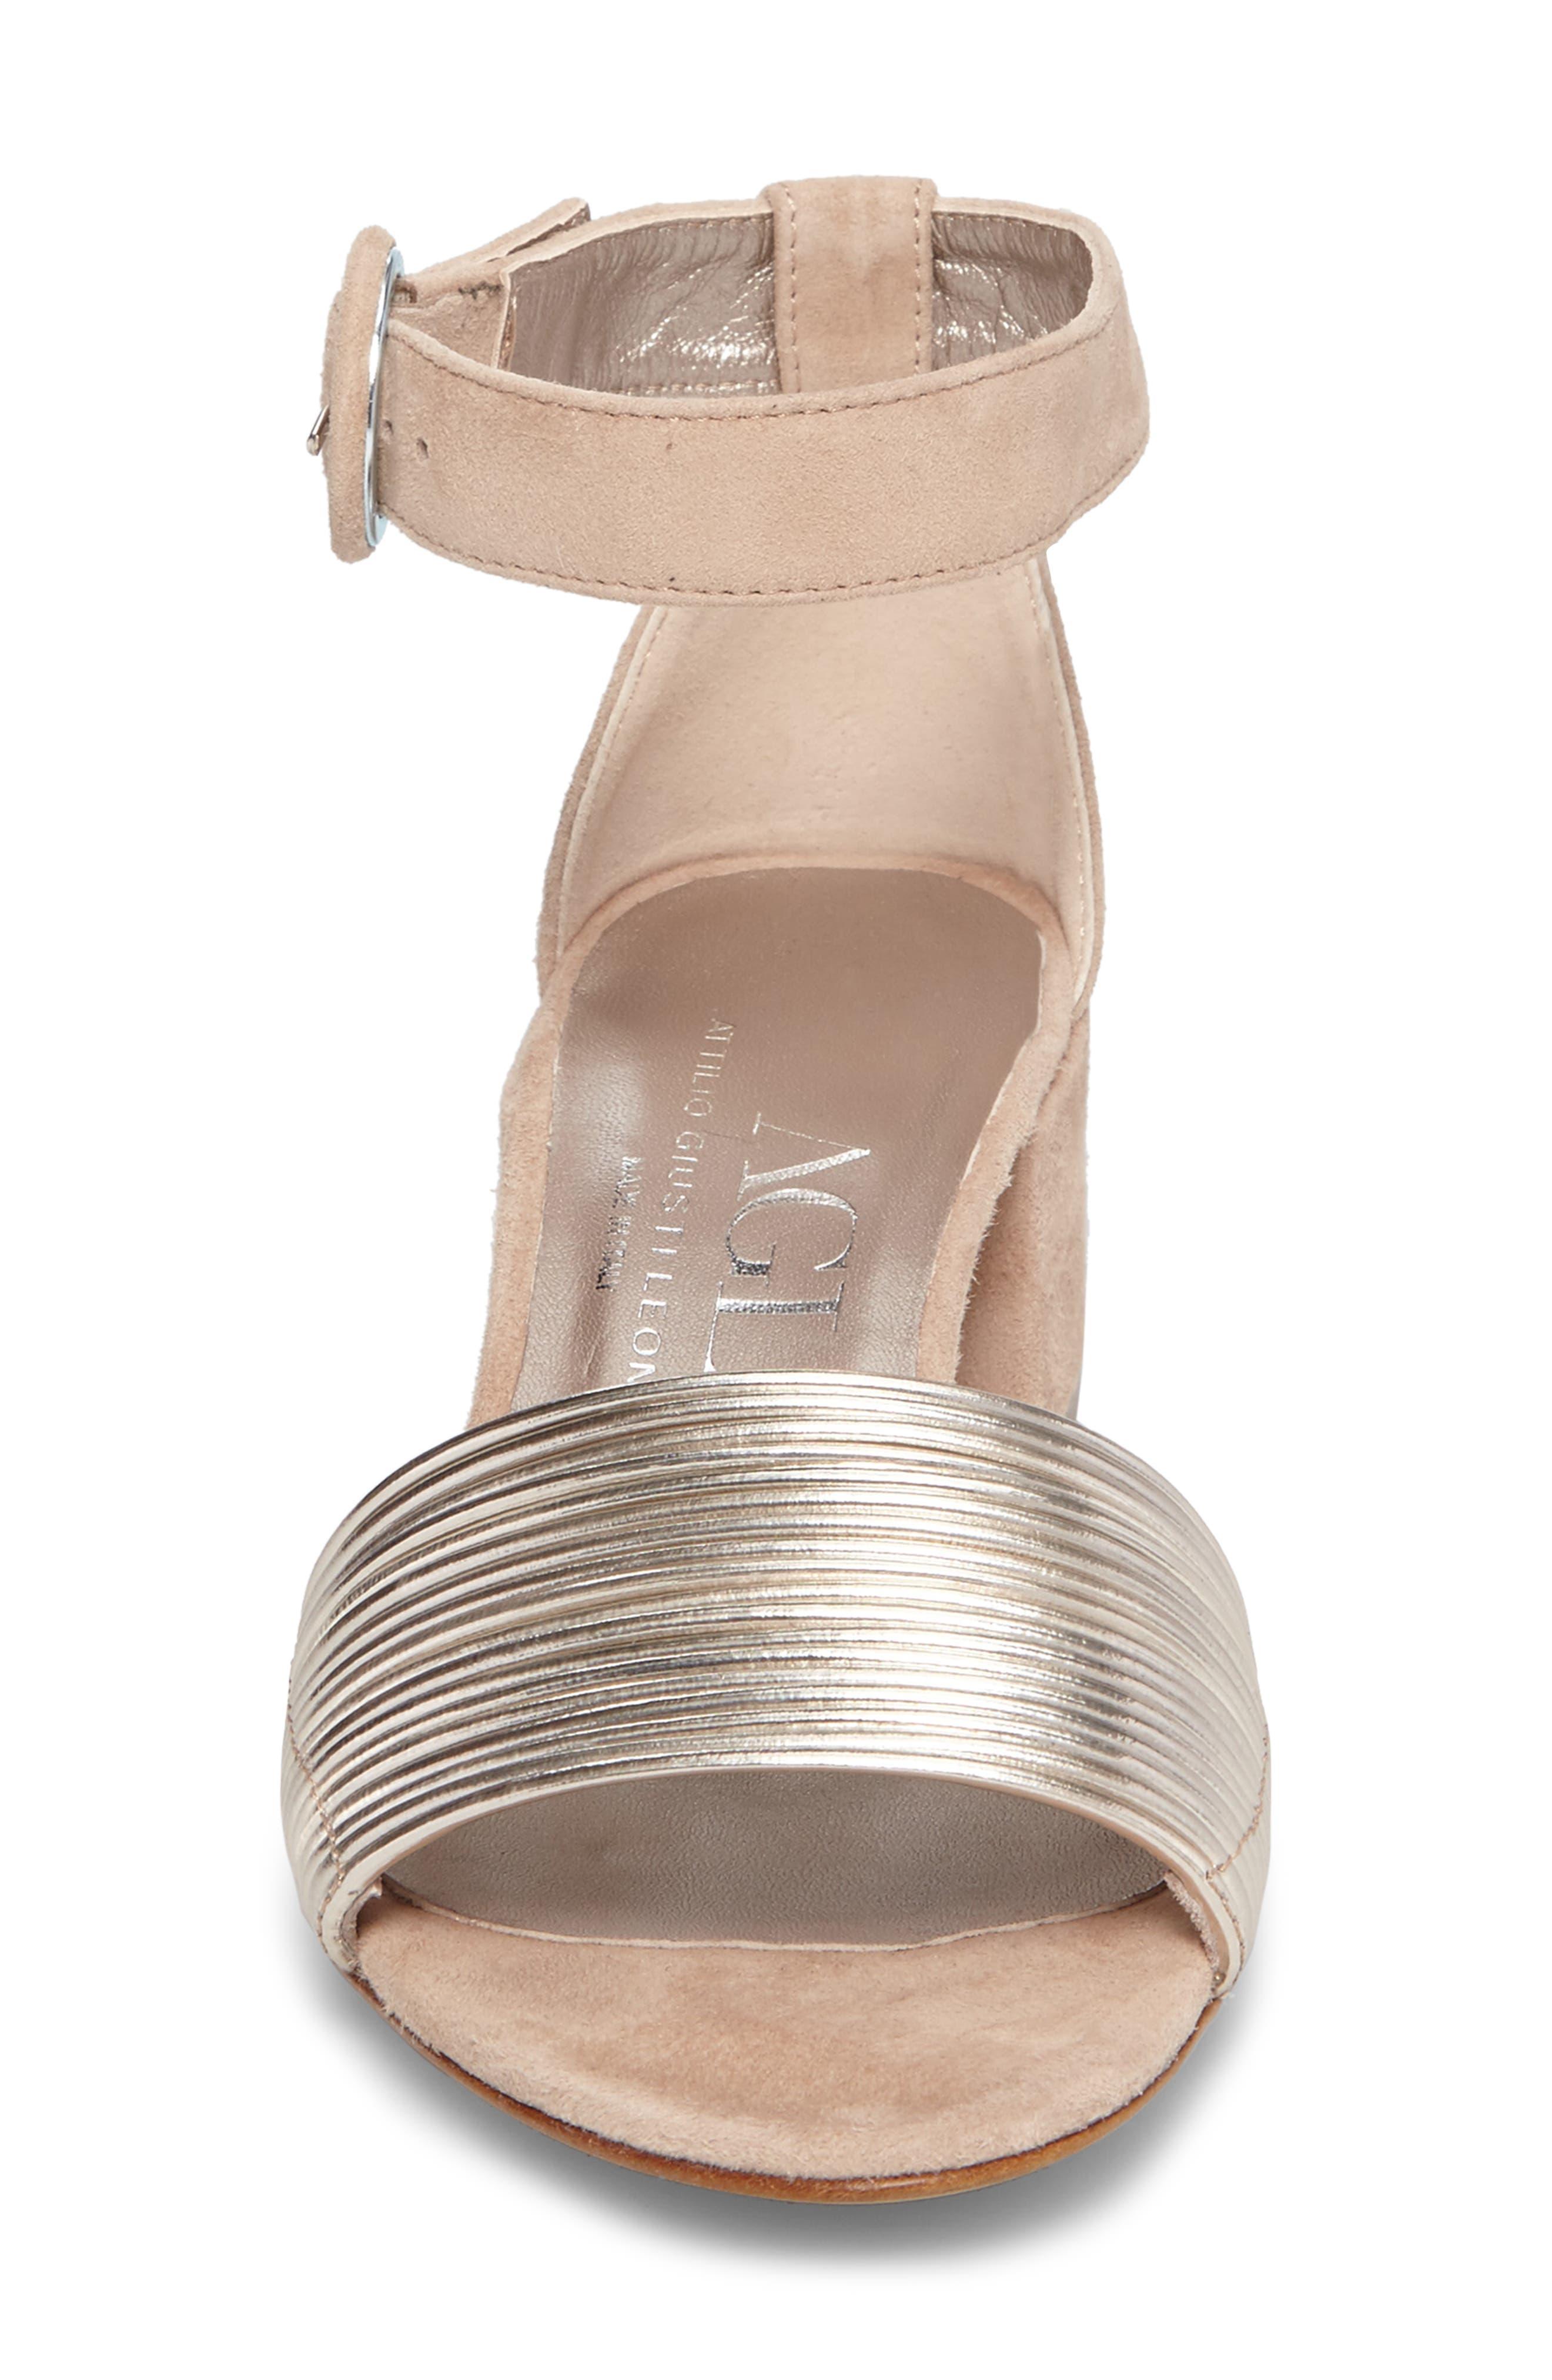 Ankle Strap Sandal,                             Alternate thumbnail 4, color,                             Platinum Leather